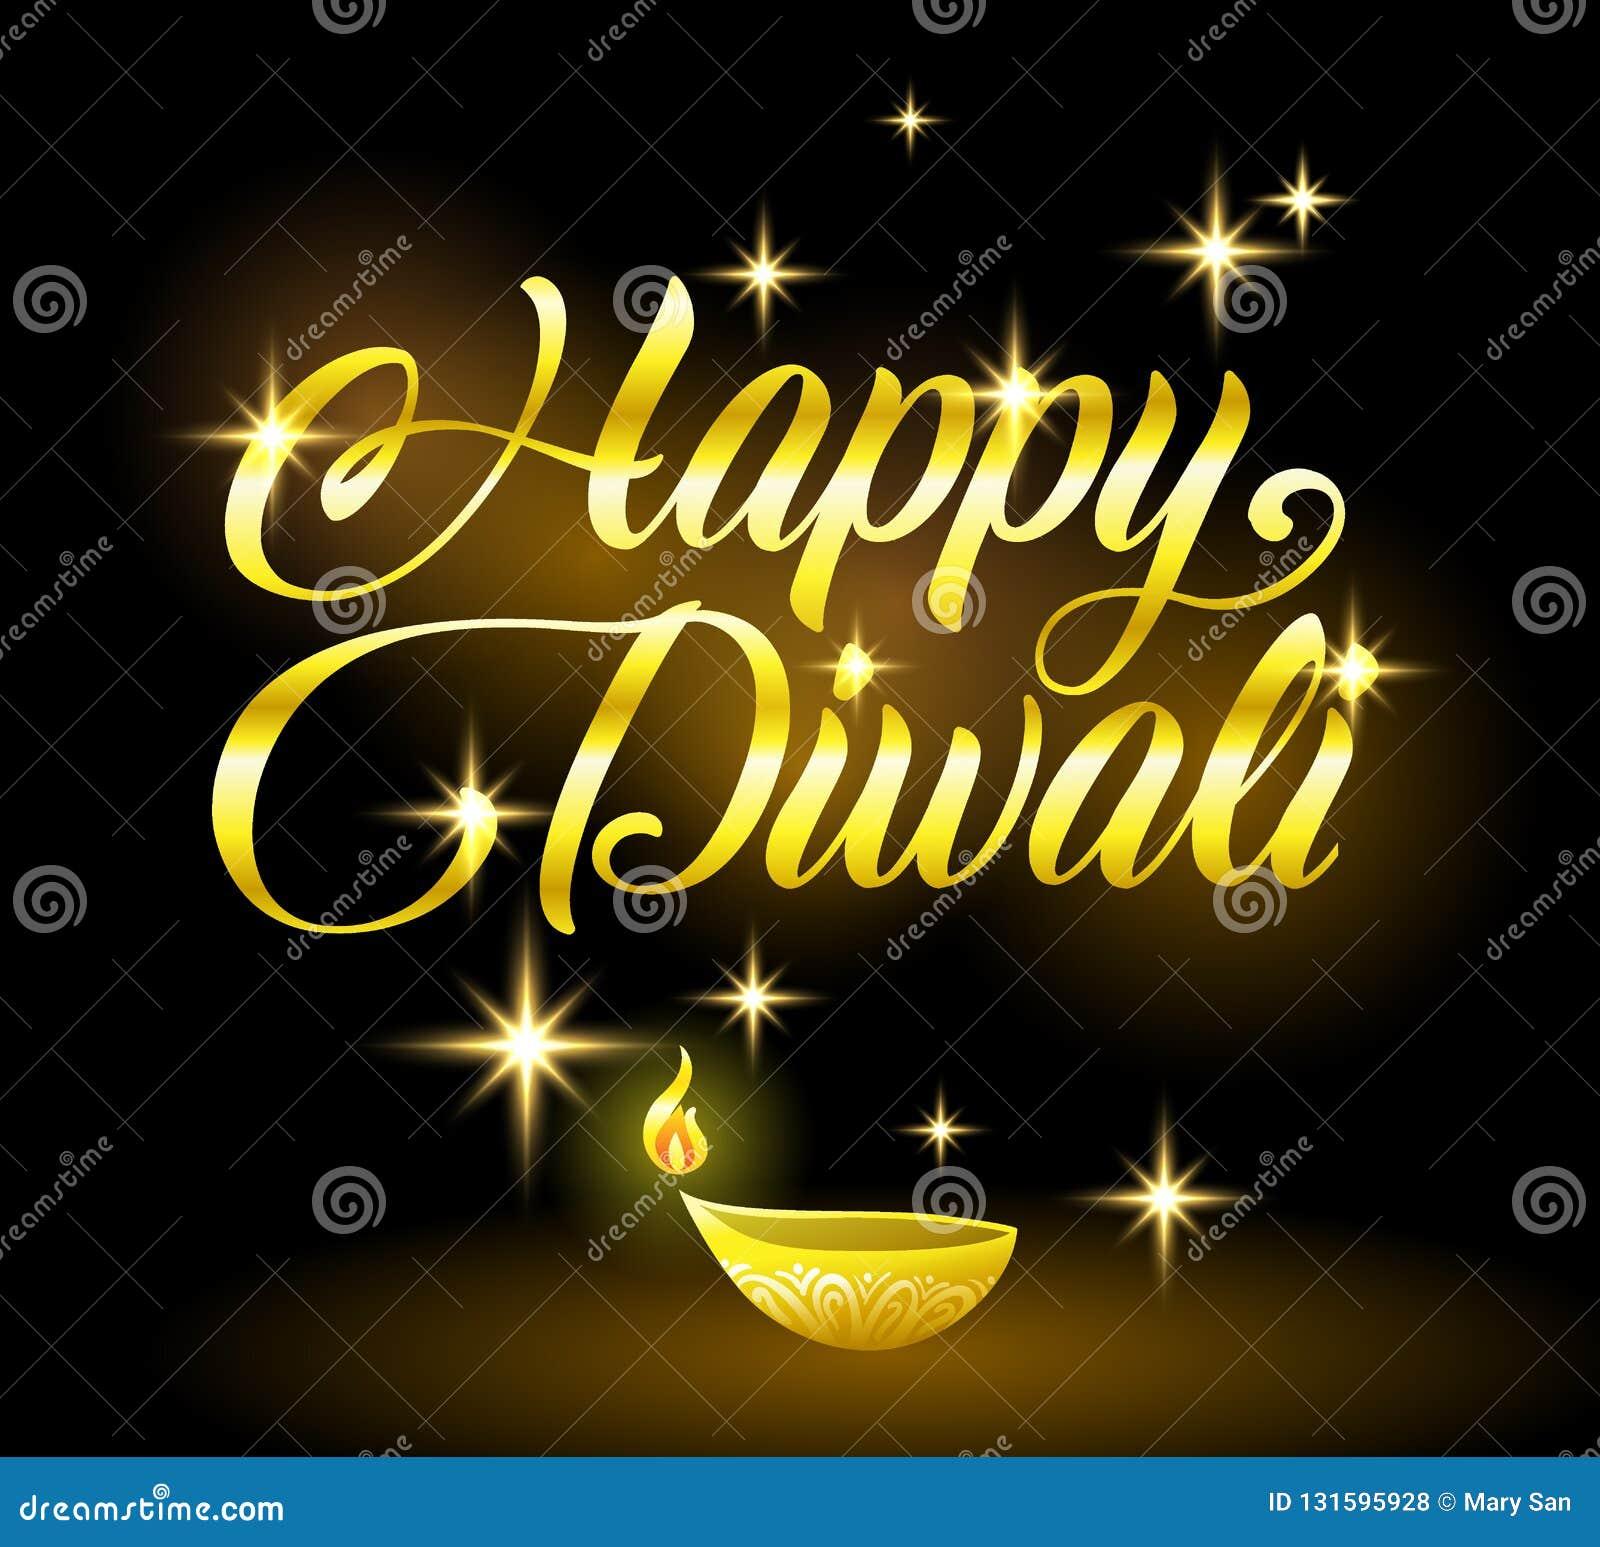 Golden Happy Diwali Congratulation With Stars On Black